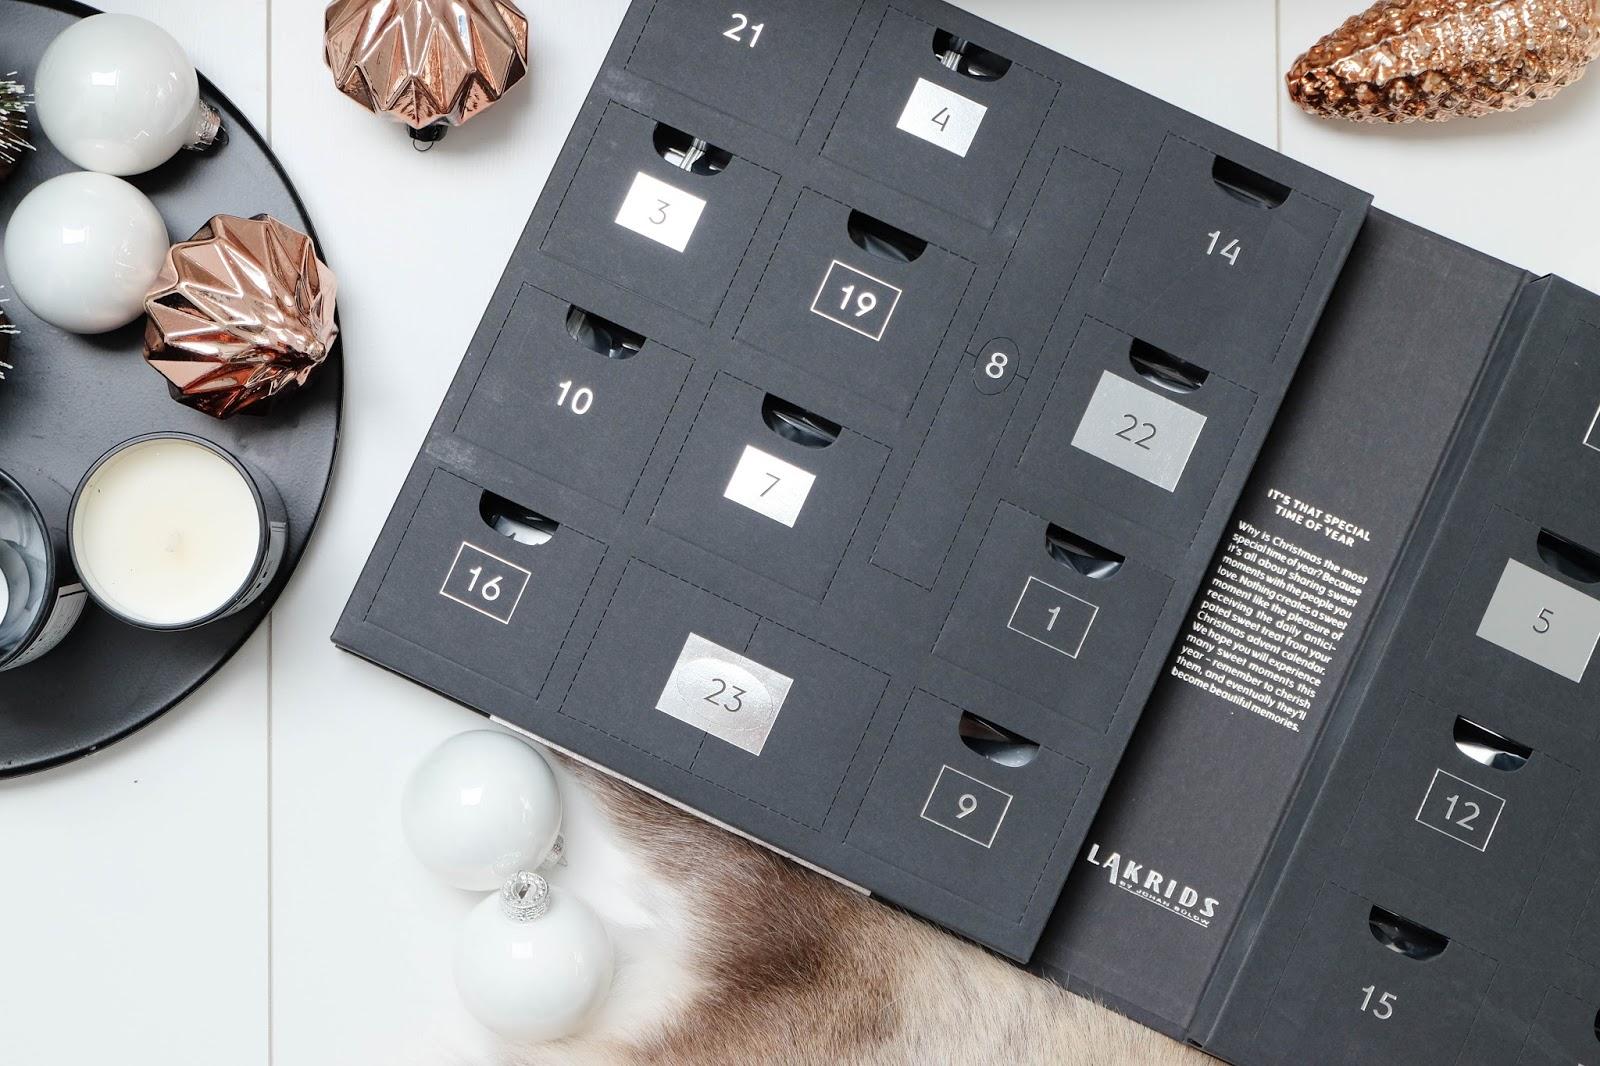 die sch nsten adventskalender 2016 victoria 39 s little secrets. Black Bedroom Furniture Sets. Home Design Ideas